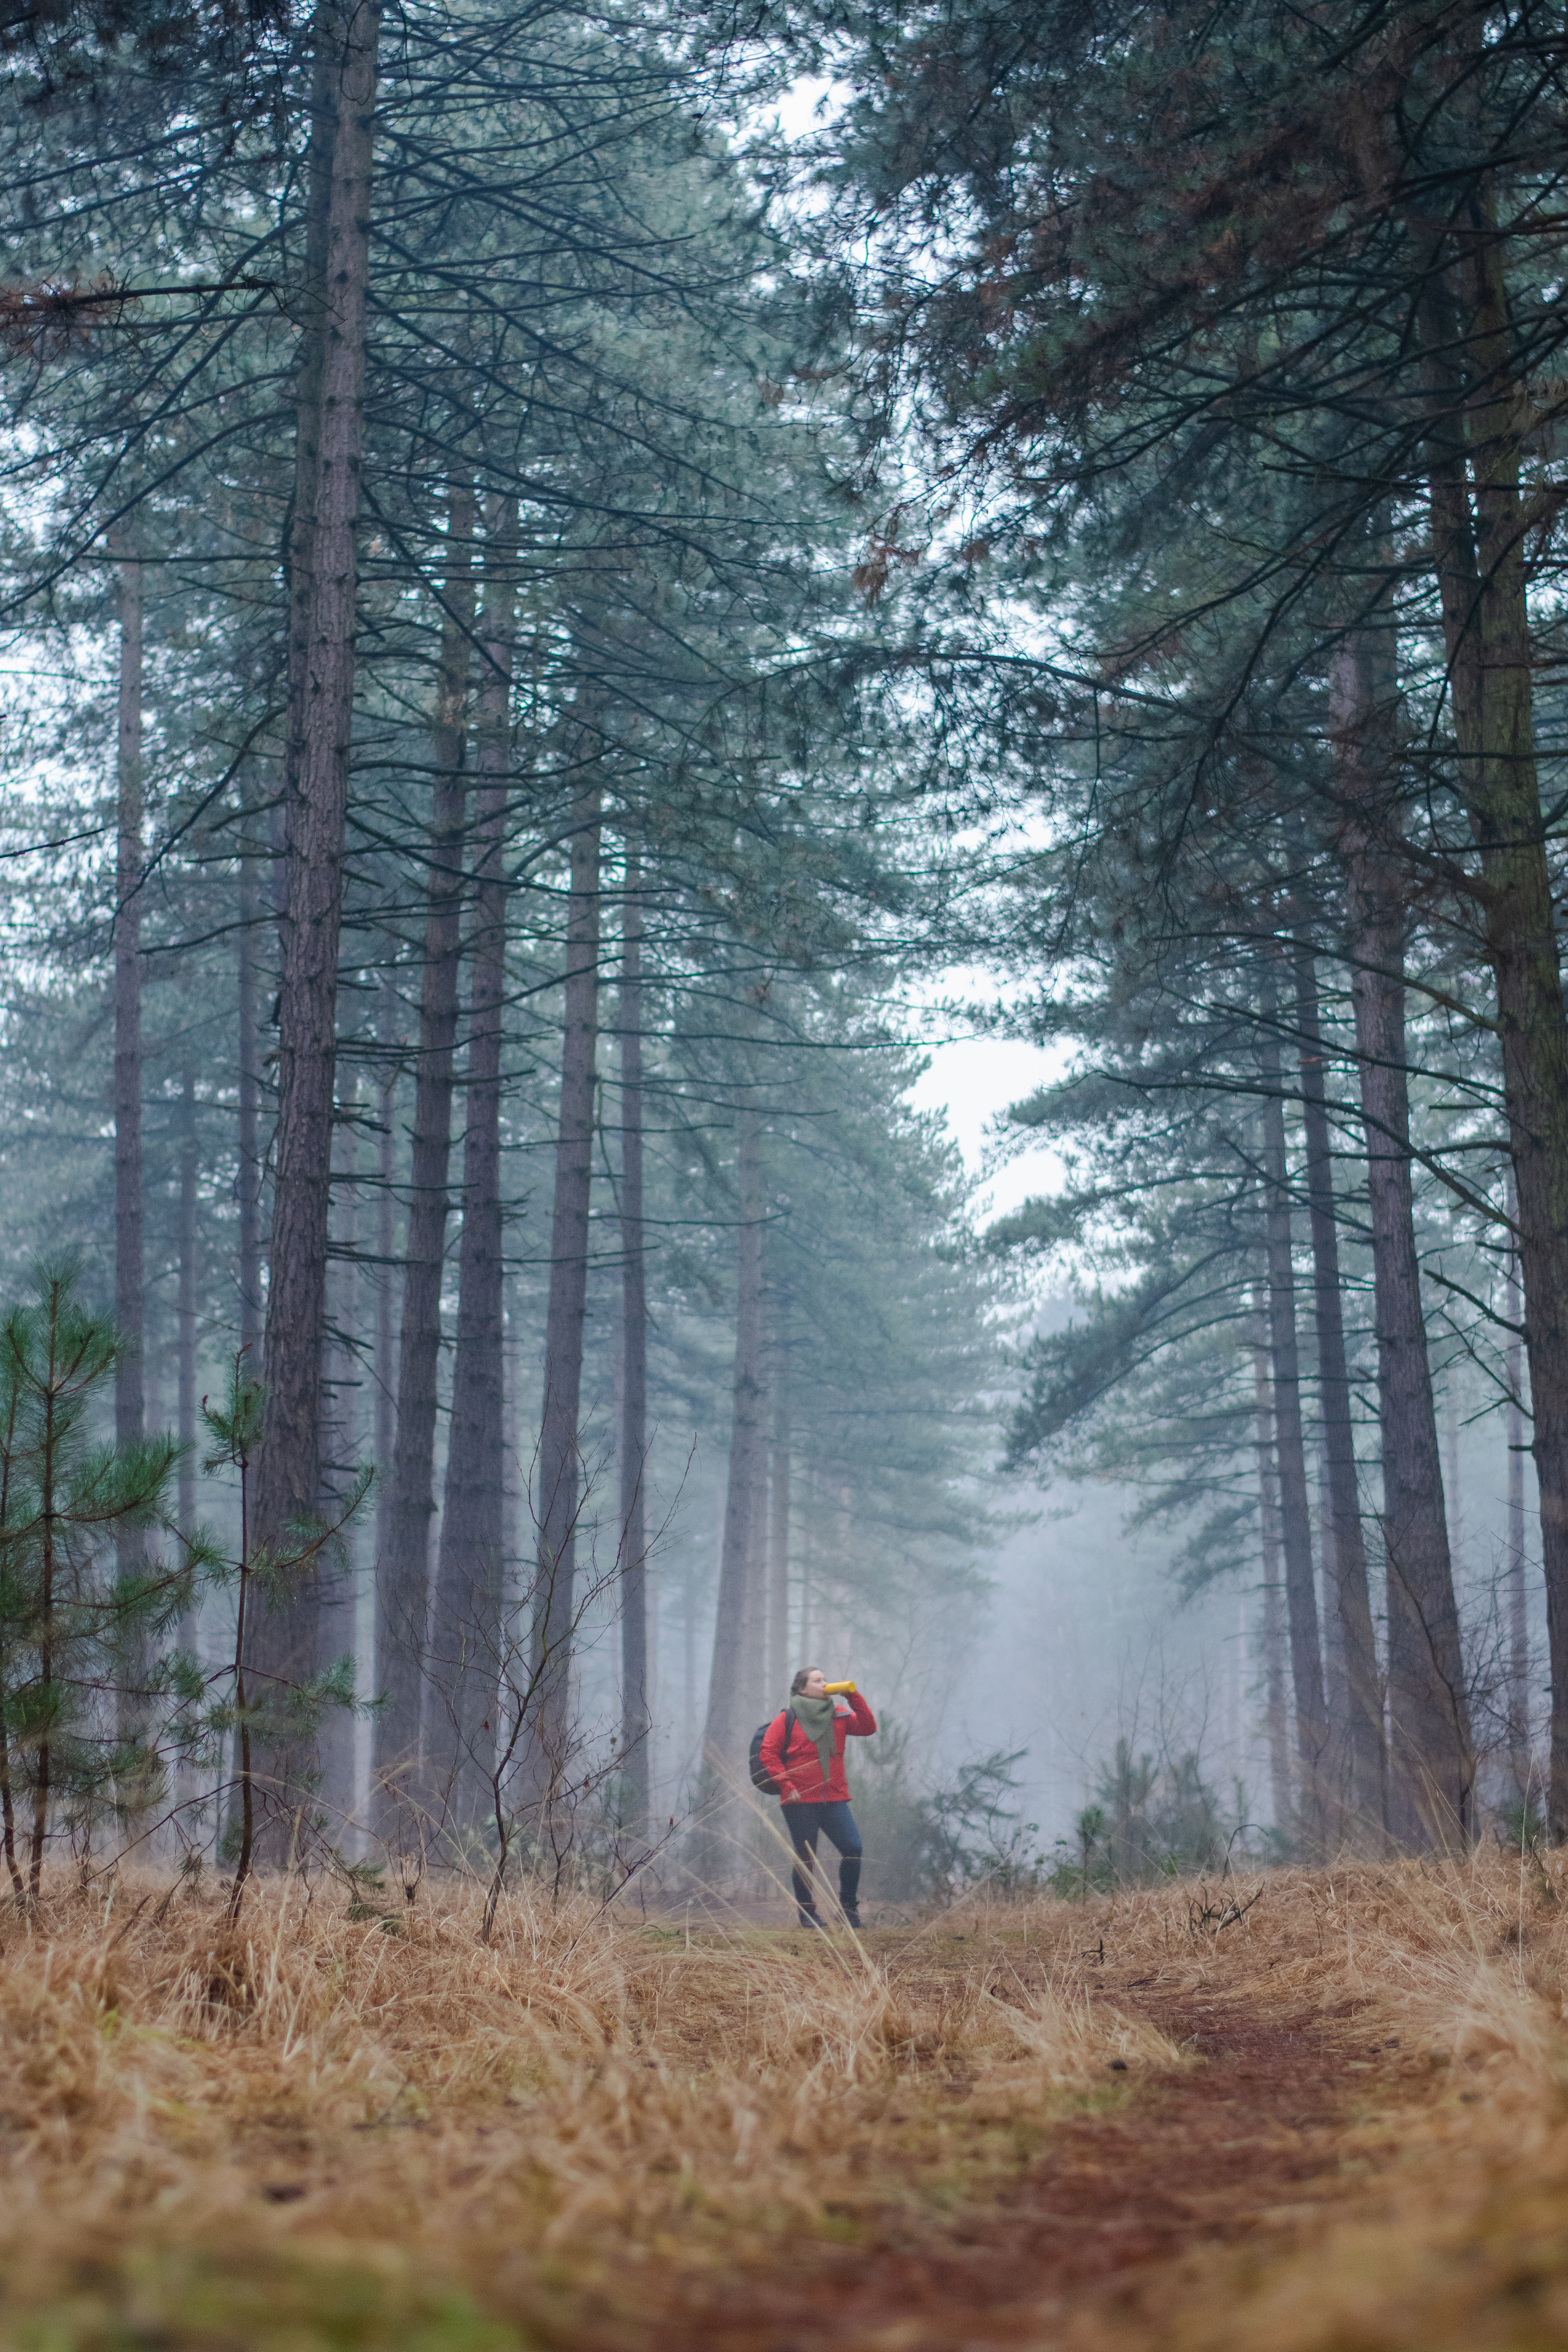 Kalmthoutse Heide België - CO2 compensatie - duurzaam reizen - eco reizen - blogger